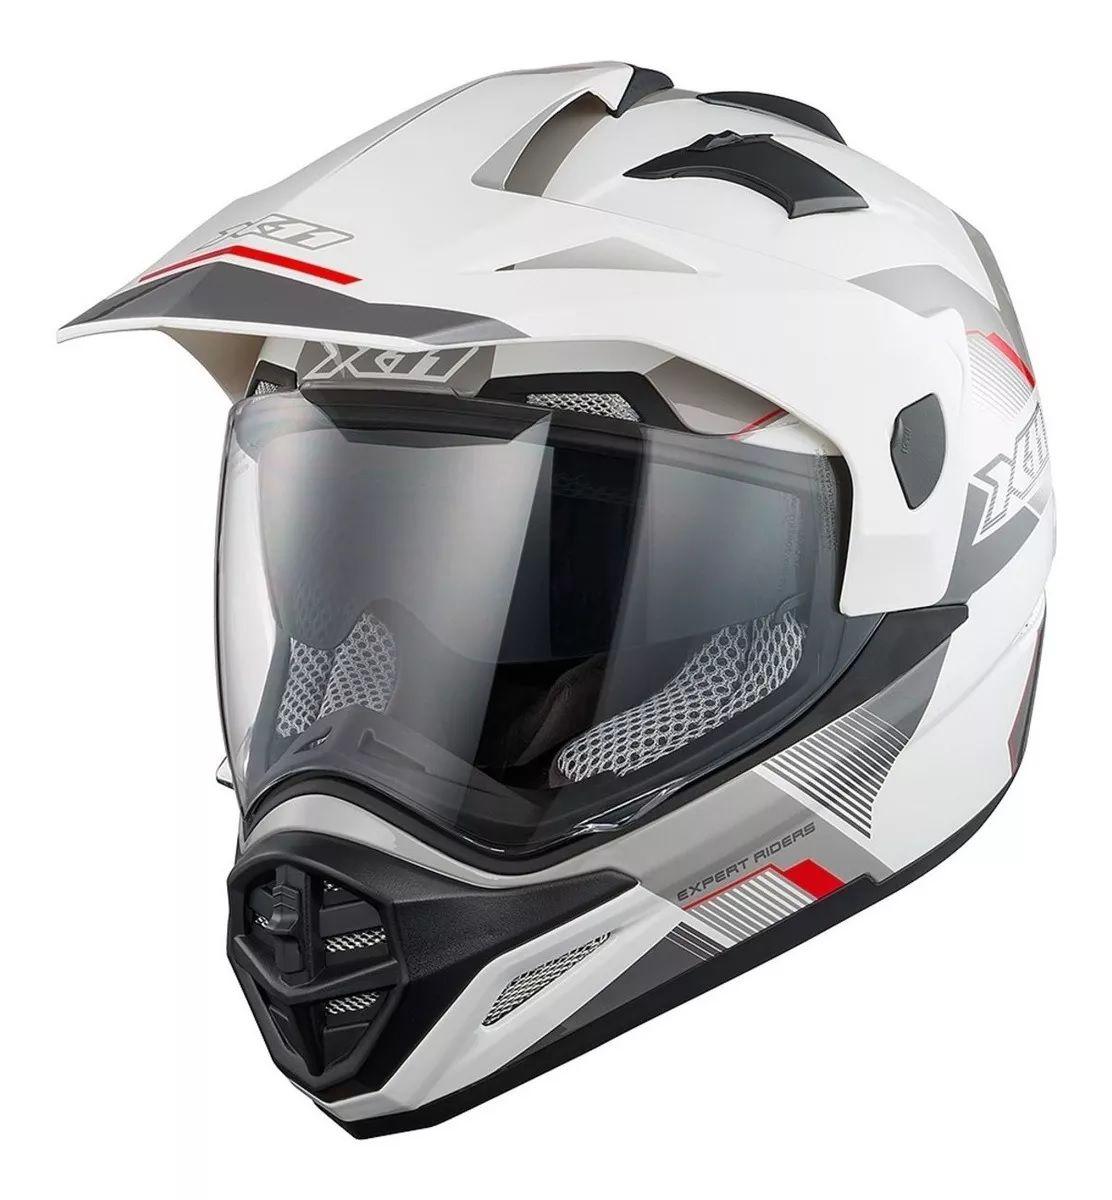 Capacete Crossover X11 X3 Oculos Interno  - Ditesta & Daihead - Moto Store